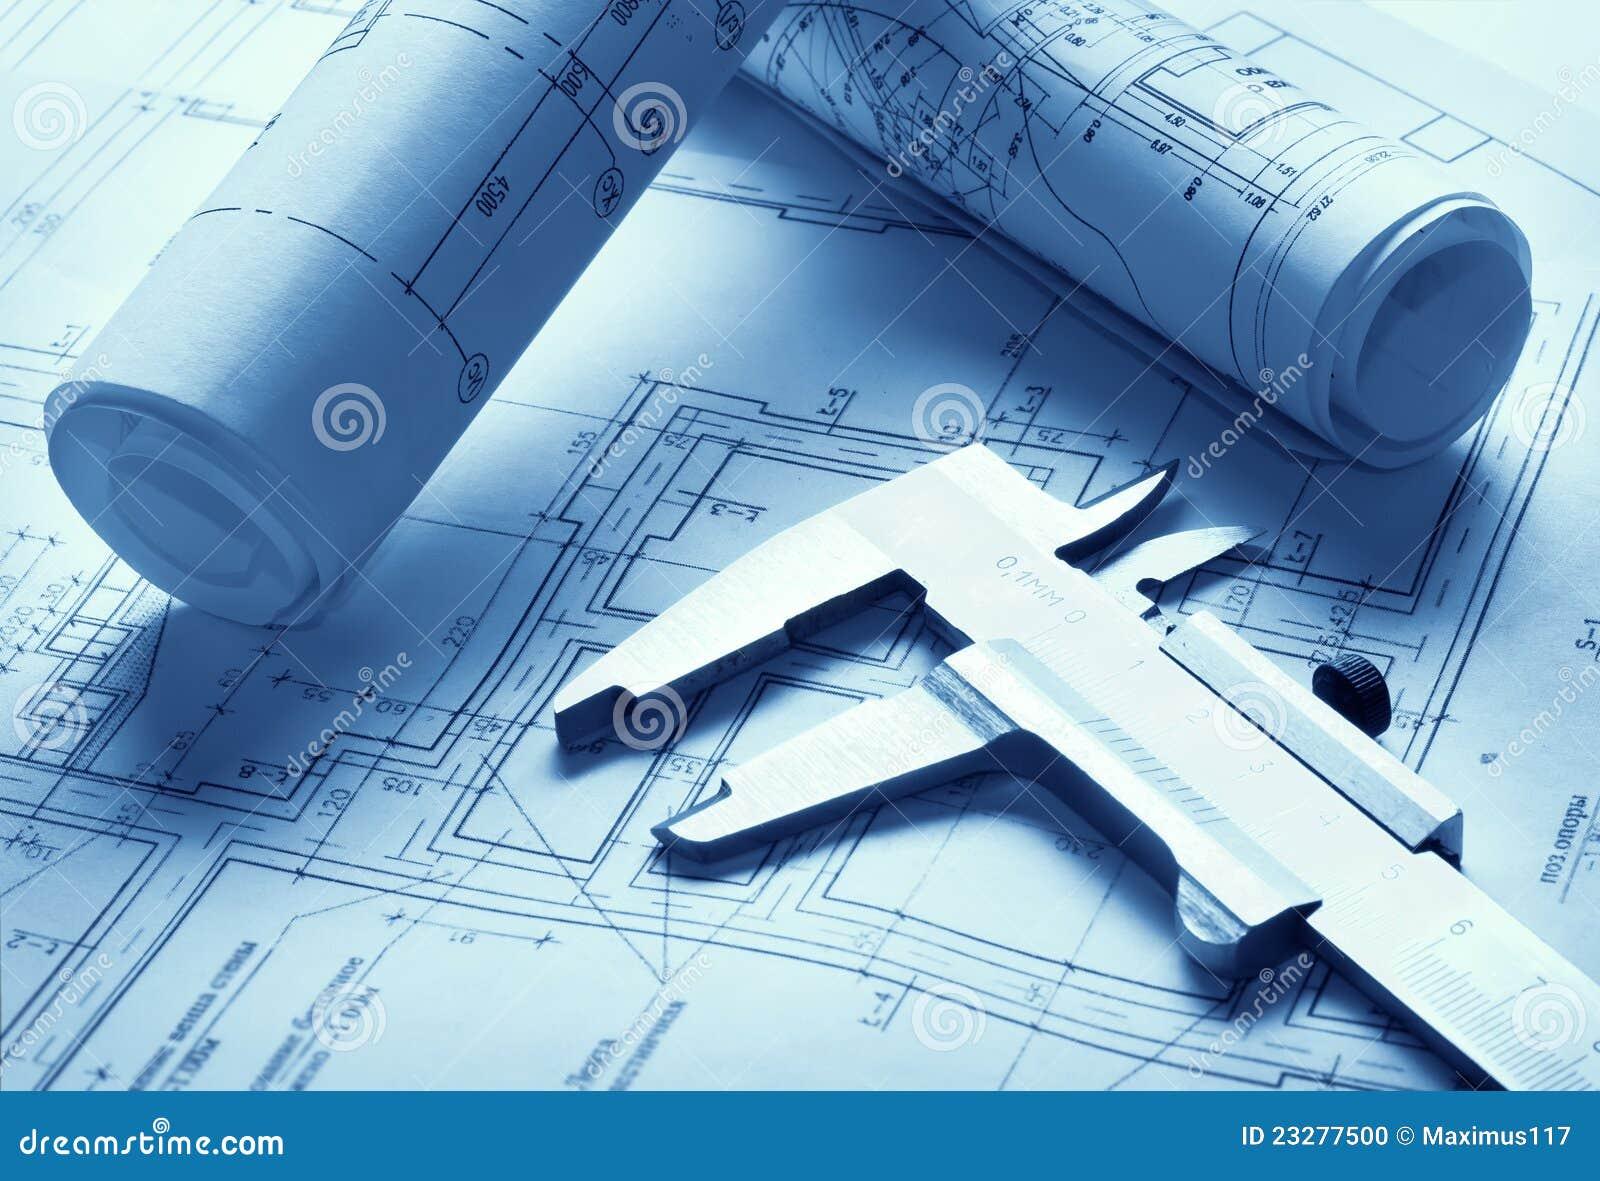 Technology blueprints stock illustration illustration of technology blueprints malvernweather Images